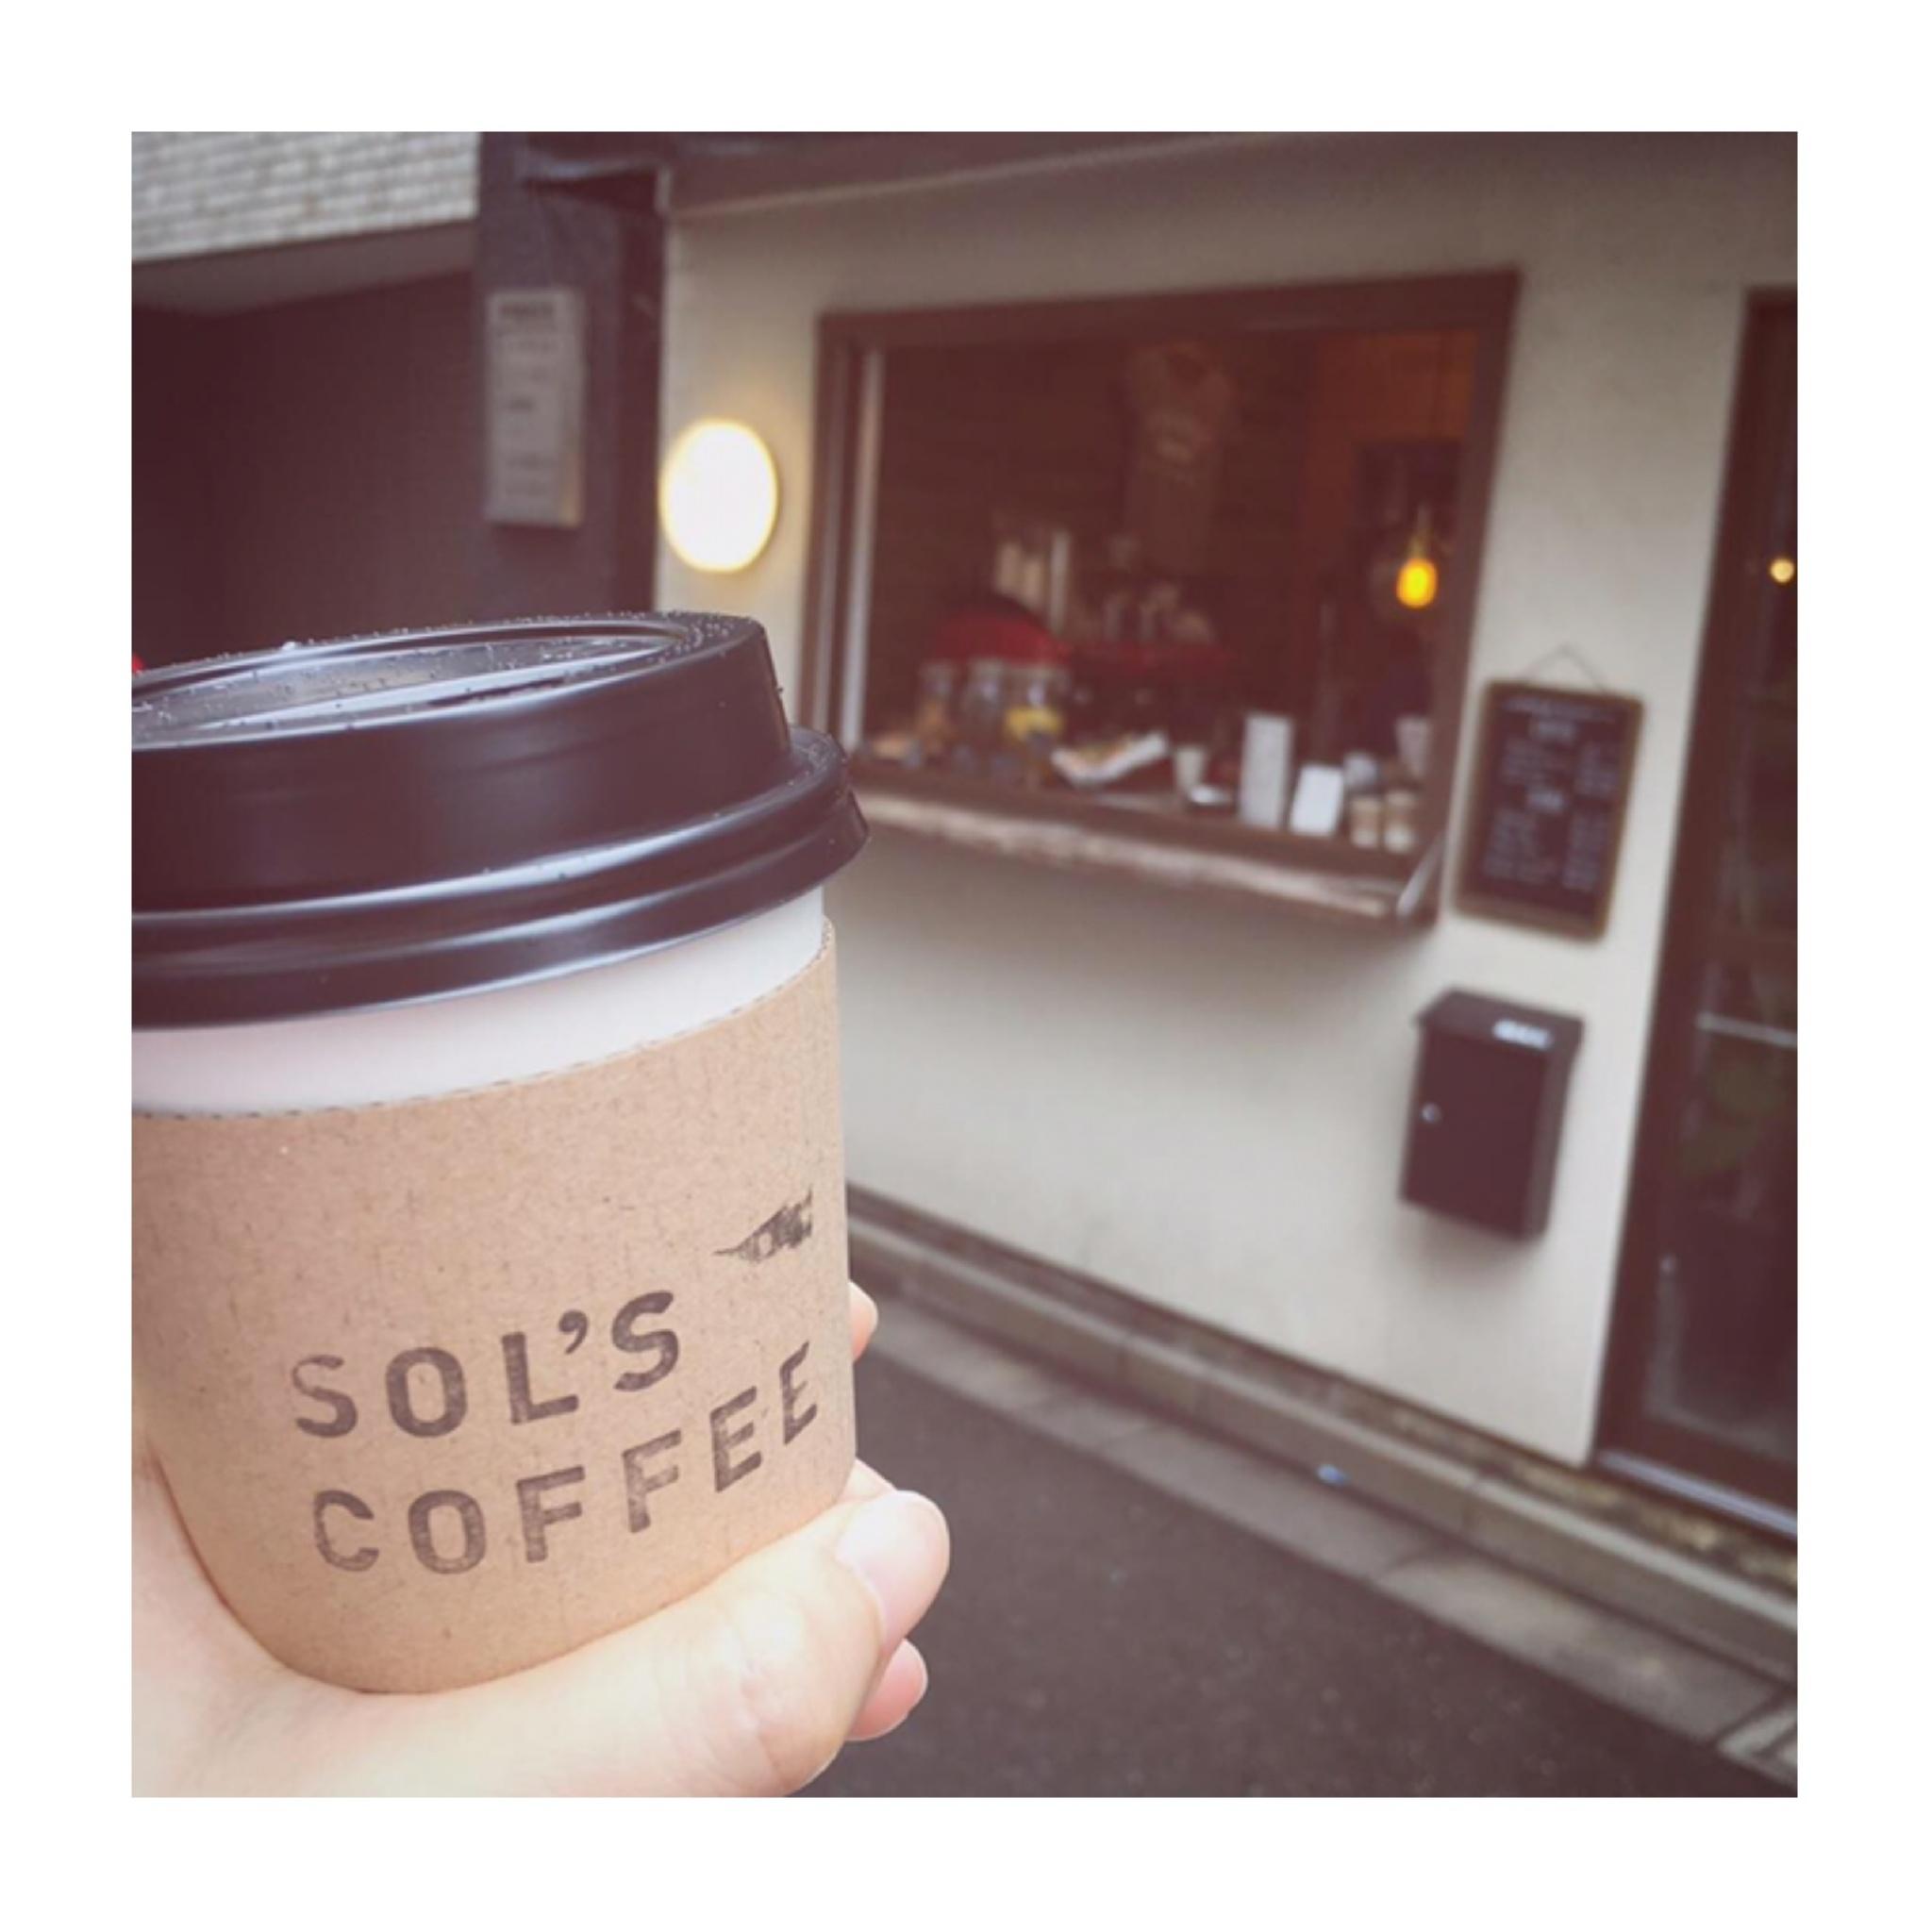 #15【#cafestagram】❤️:《東京•蔵前》身体にやさしいコーヒーを飲みに『SOL'S COFFEE』へ☻_1